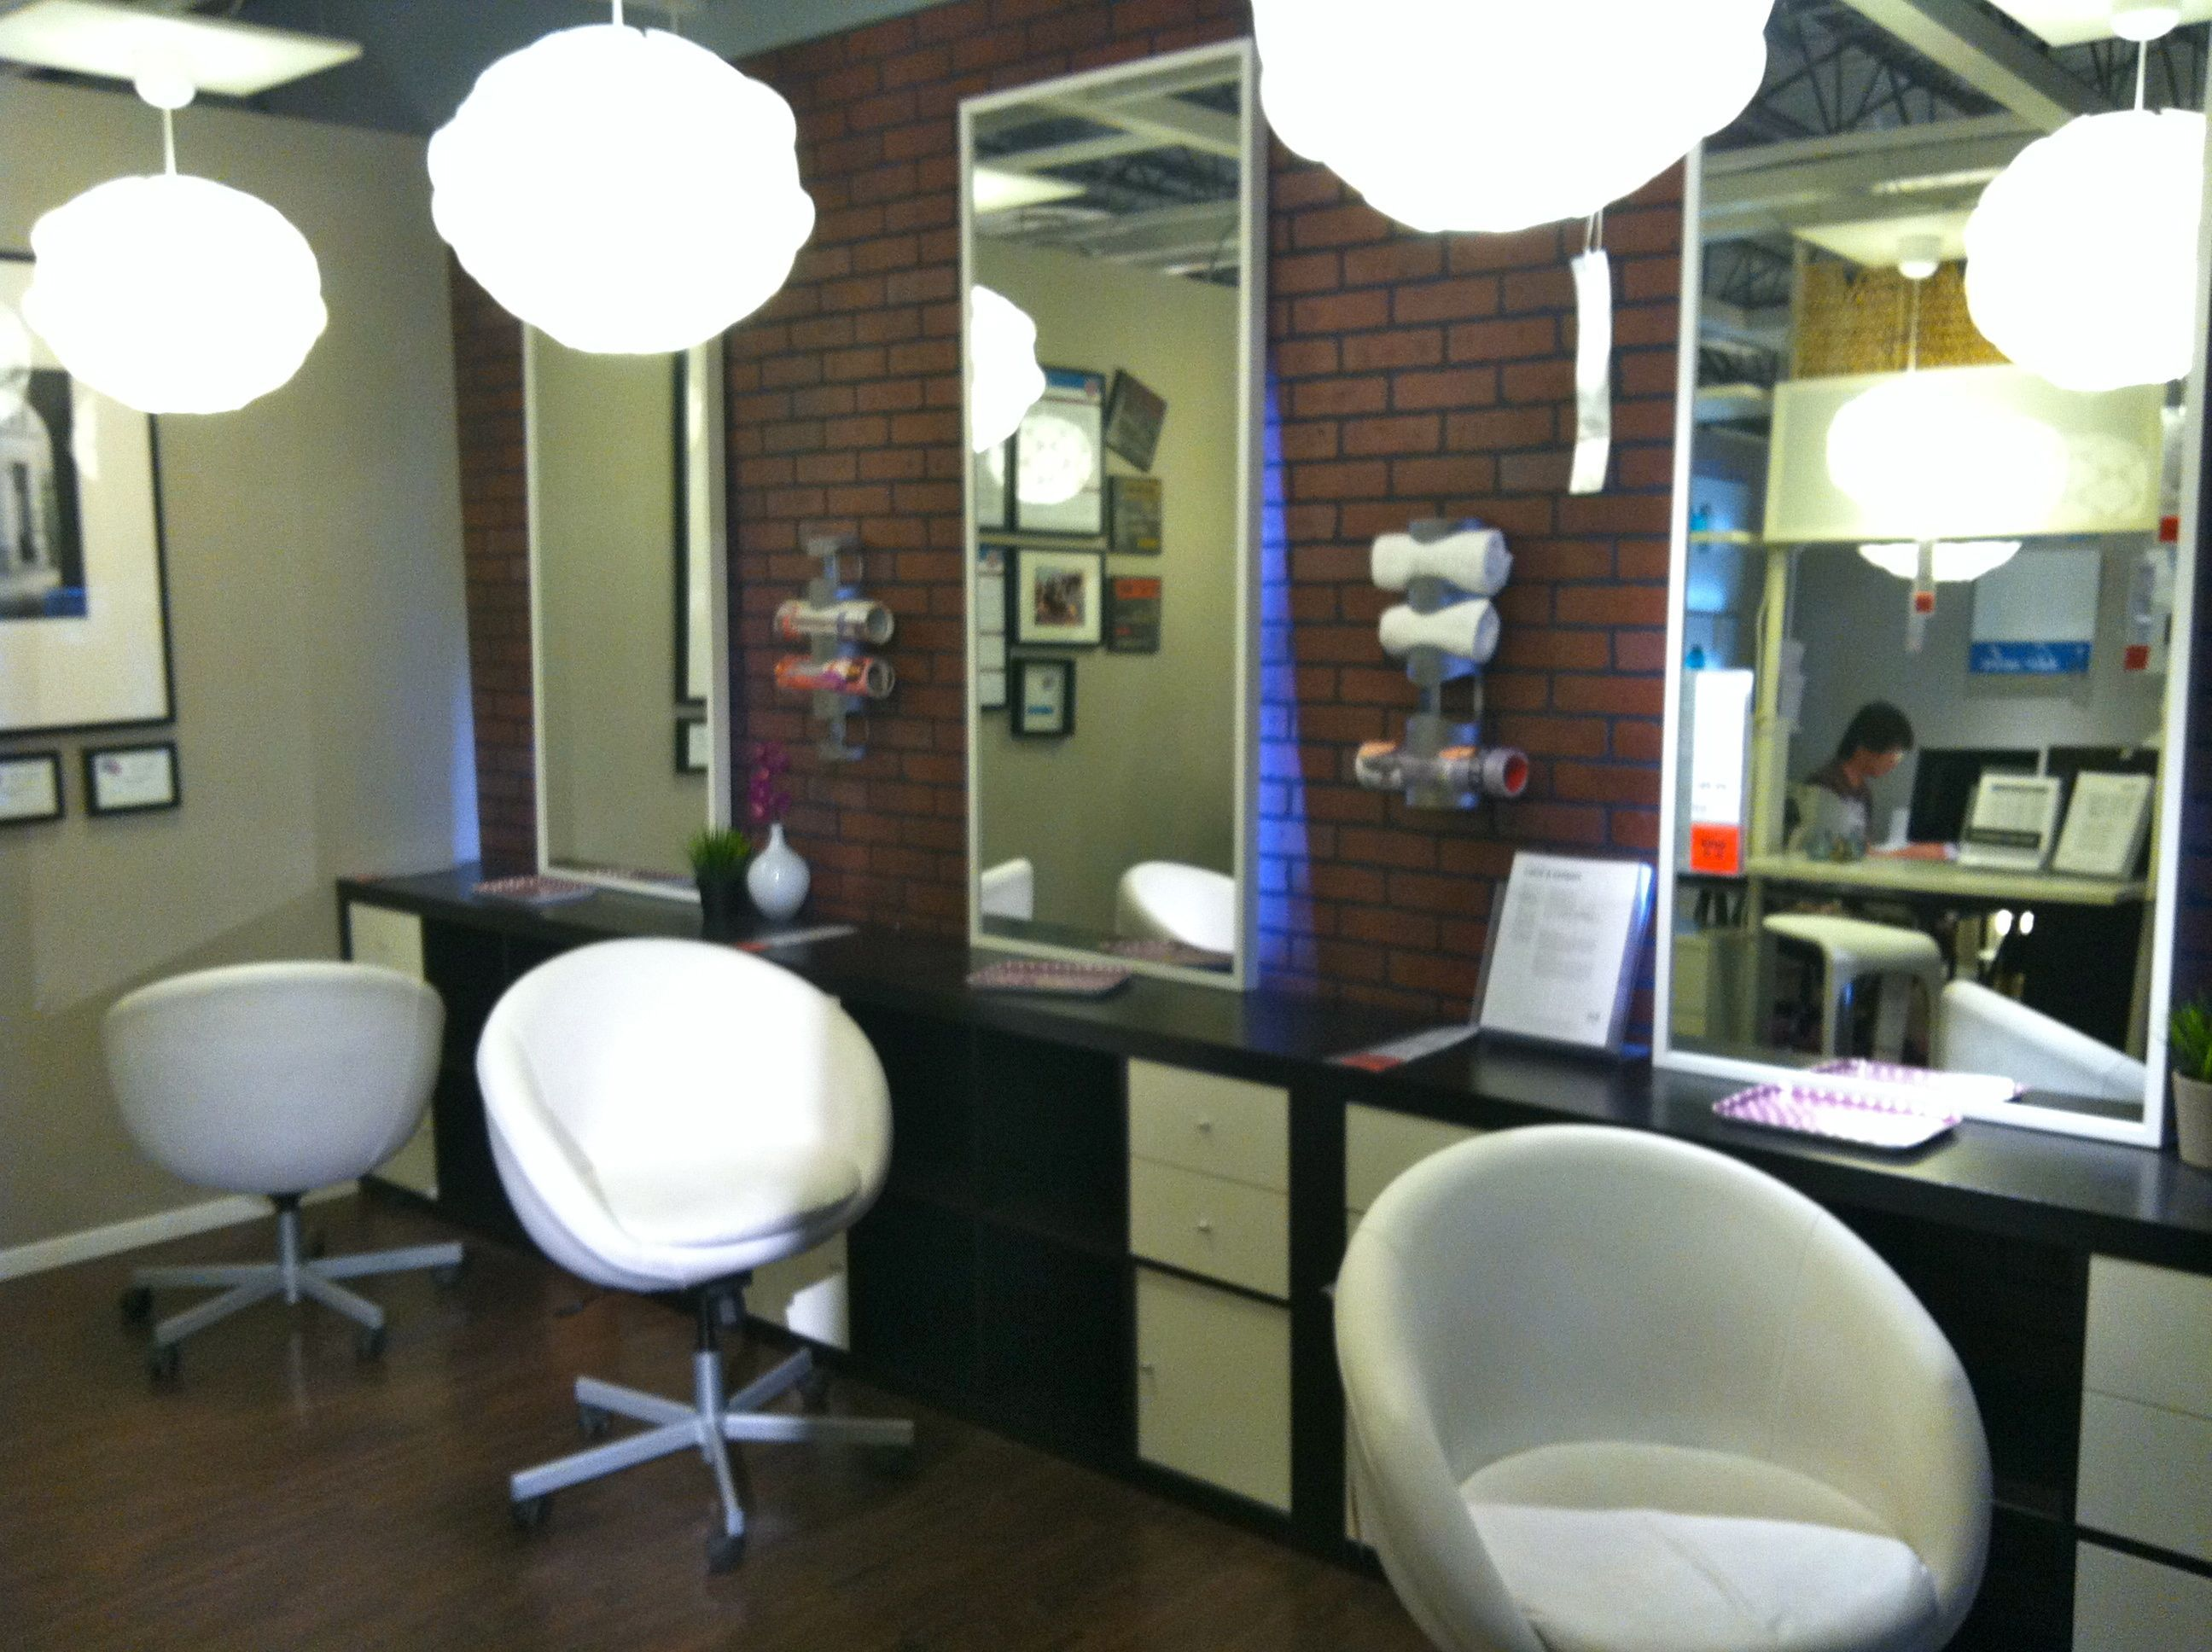 ikea hair salon ideas ikea salon furniture coats pinterest salon ideas. Black Bedroom Furniture Sets. Home Design Ideas